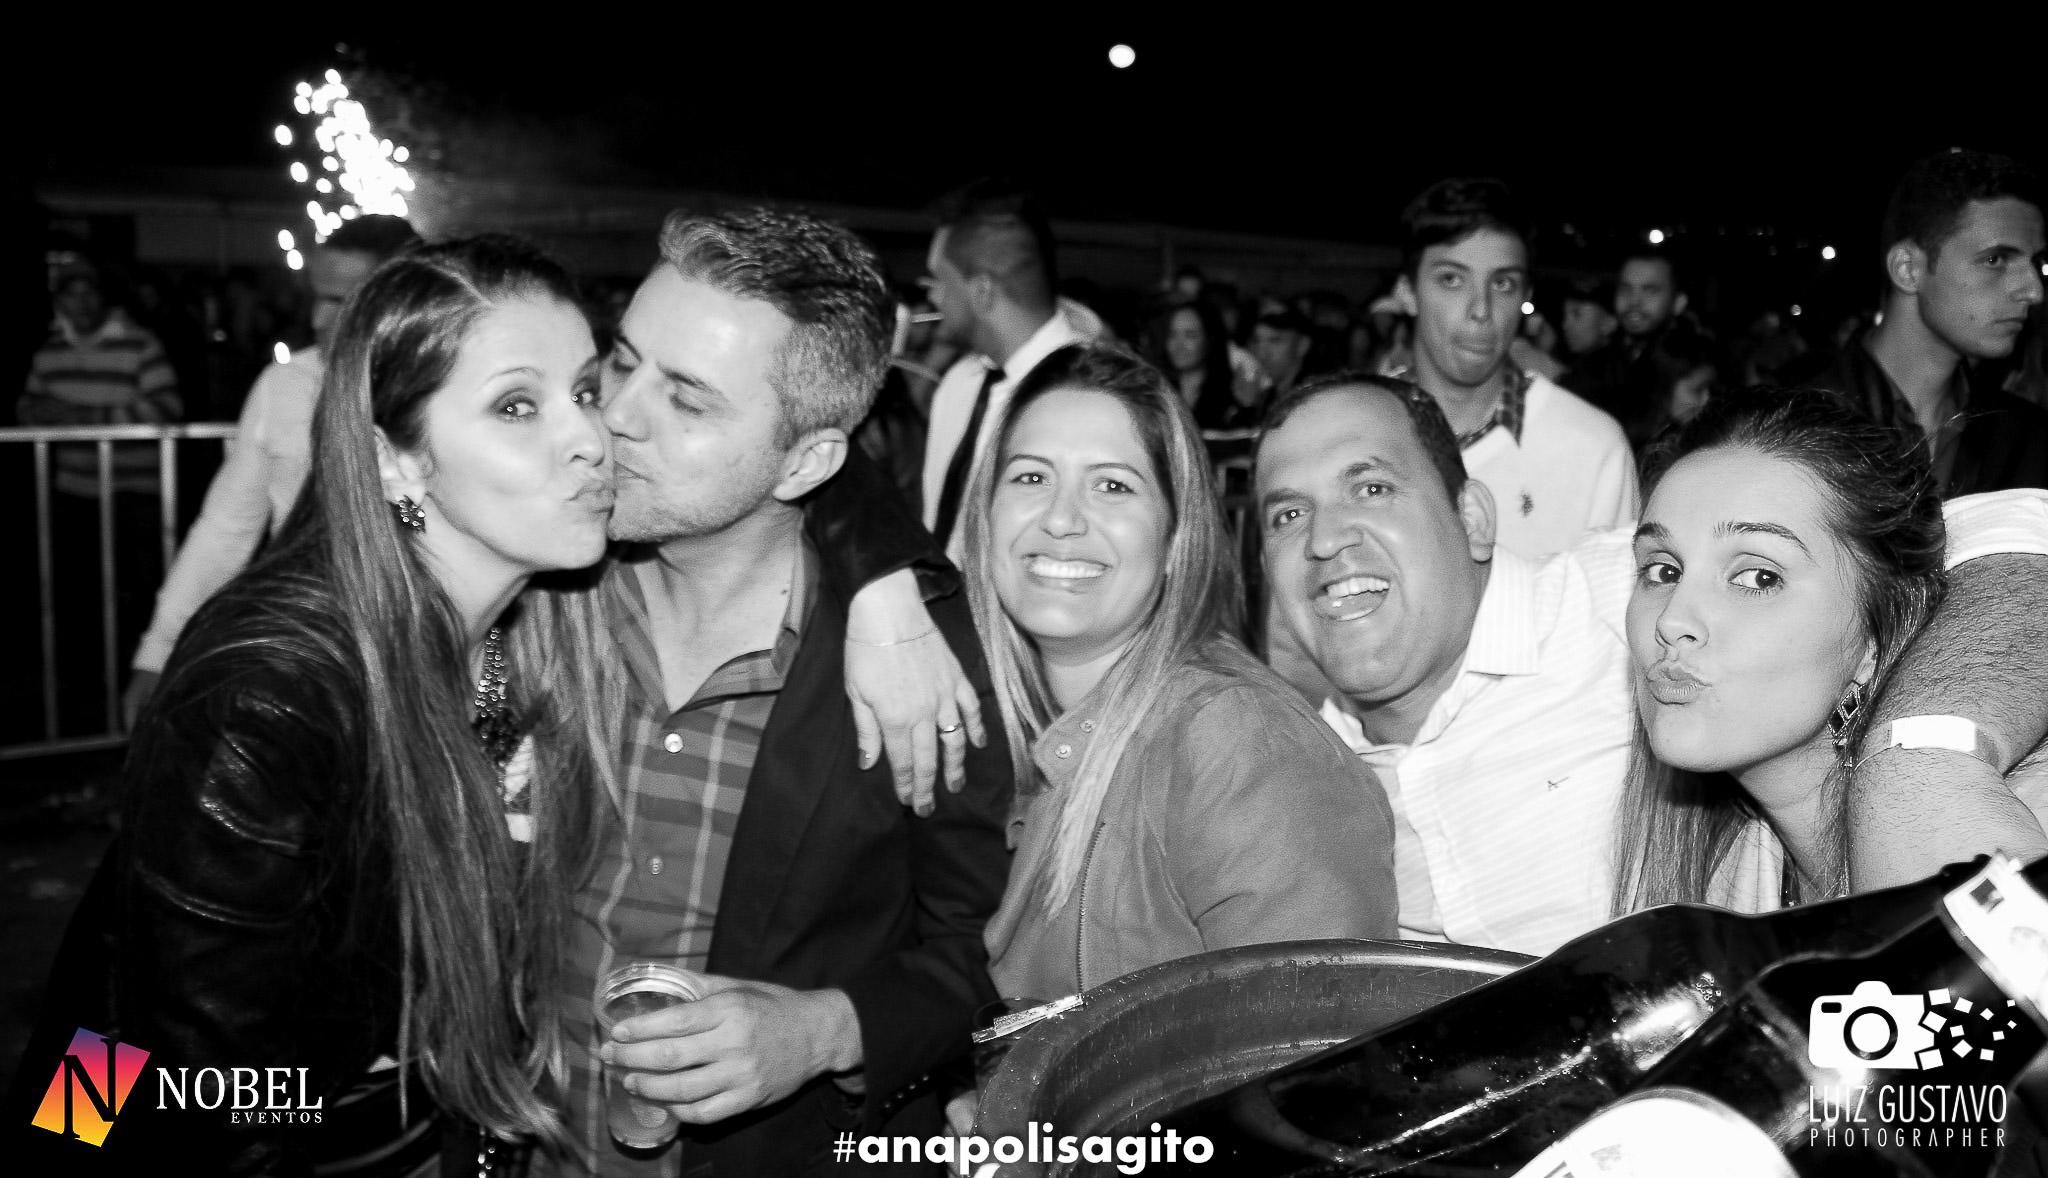 Luiz Gustavo Photographer-135